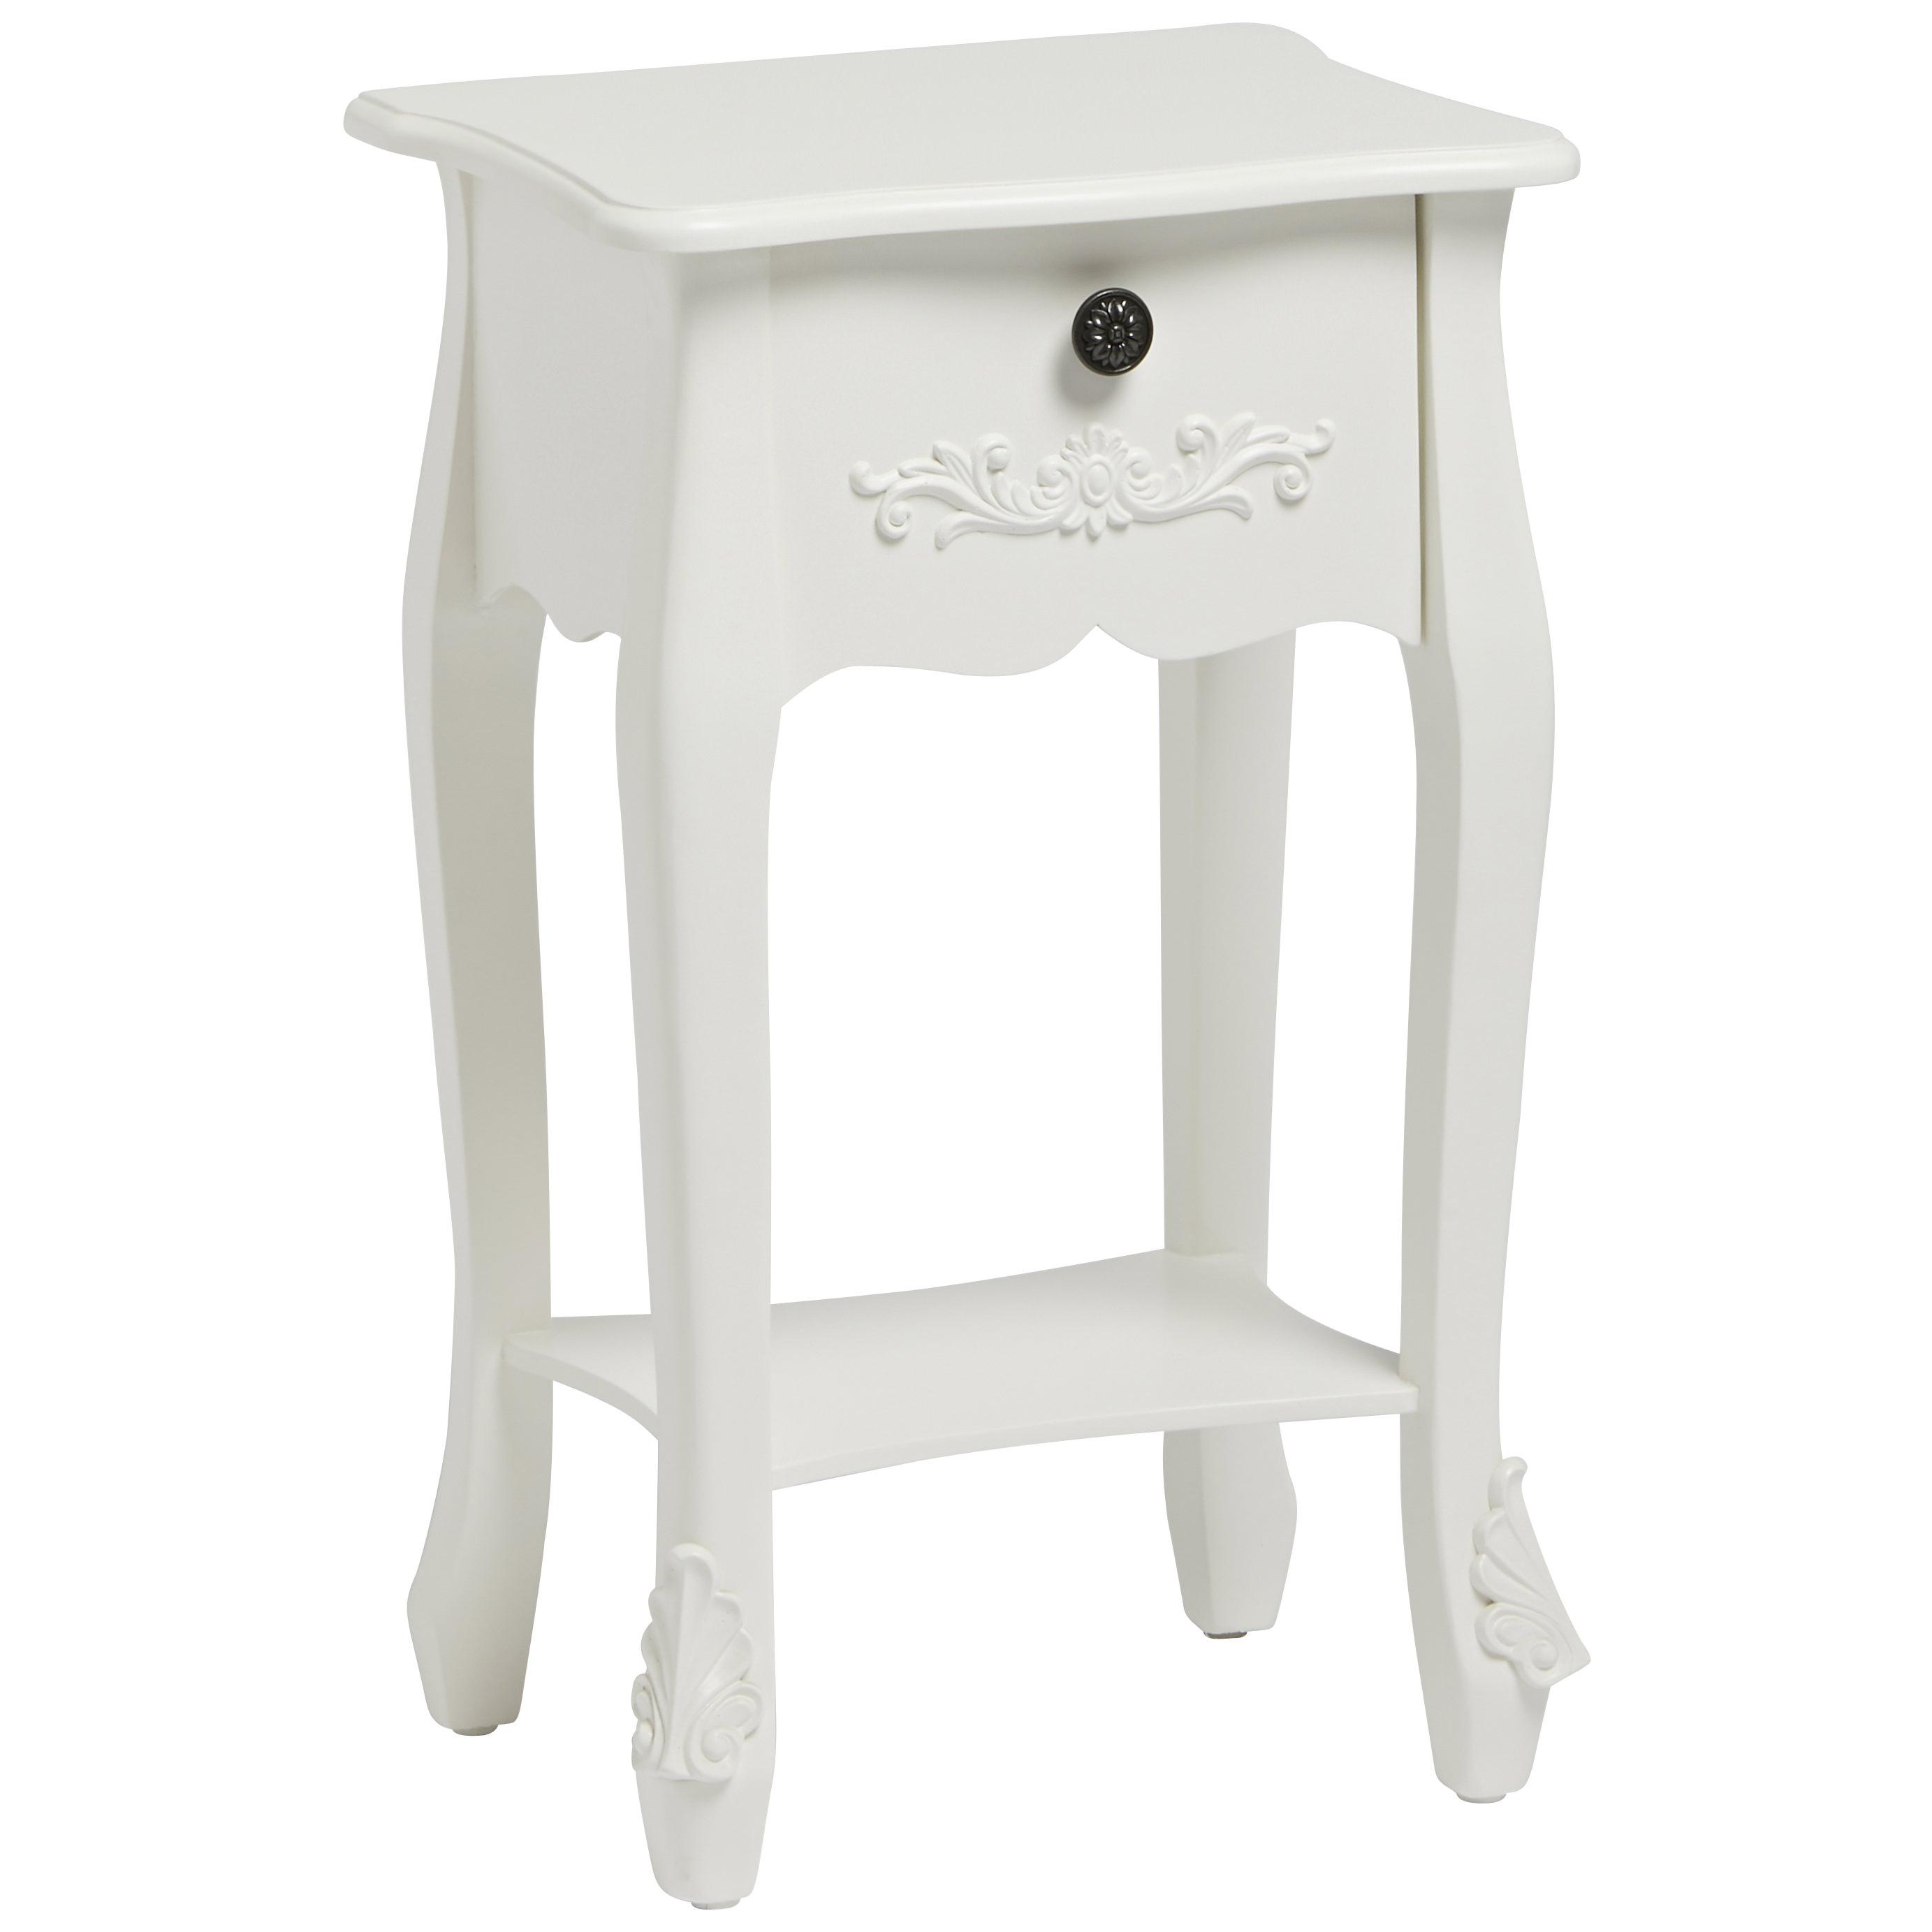 Shabby Chic Bedside Cabinet Bedroom End Lamp Table 1 Drawer Chest Black White Ebay